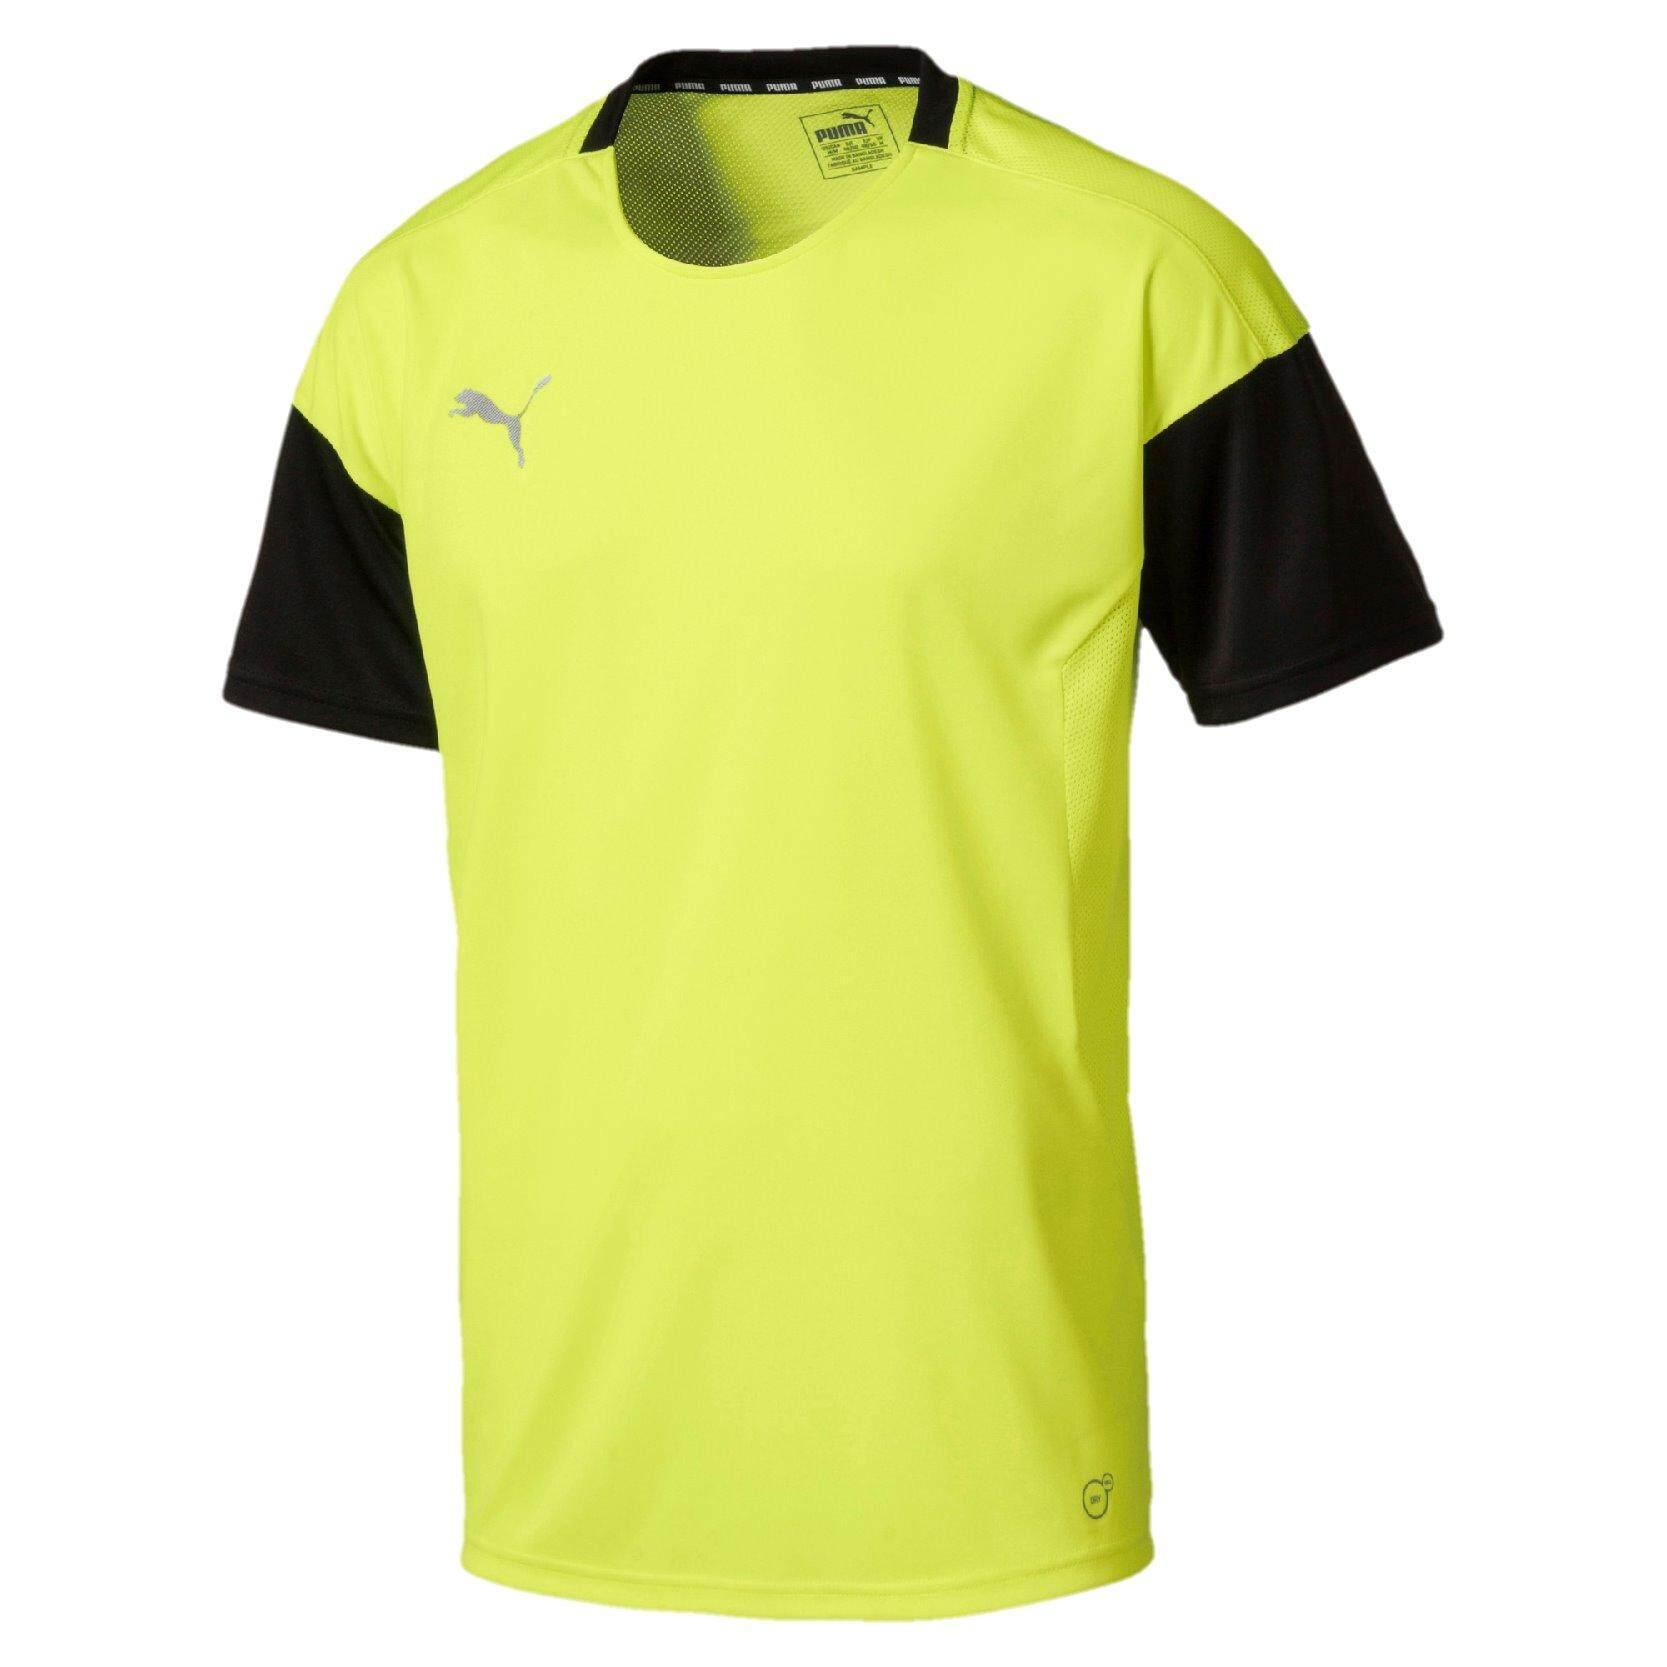 eba83aa0ba Puma T-Shirts & Tops price in Malaysia - Best Puma T-Shirts & Tops ...